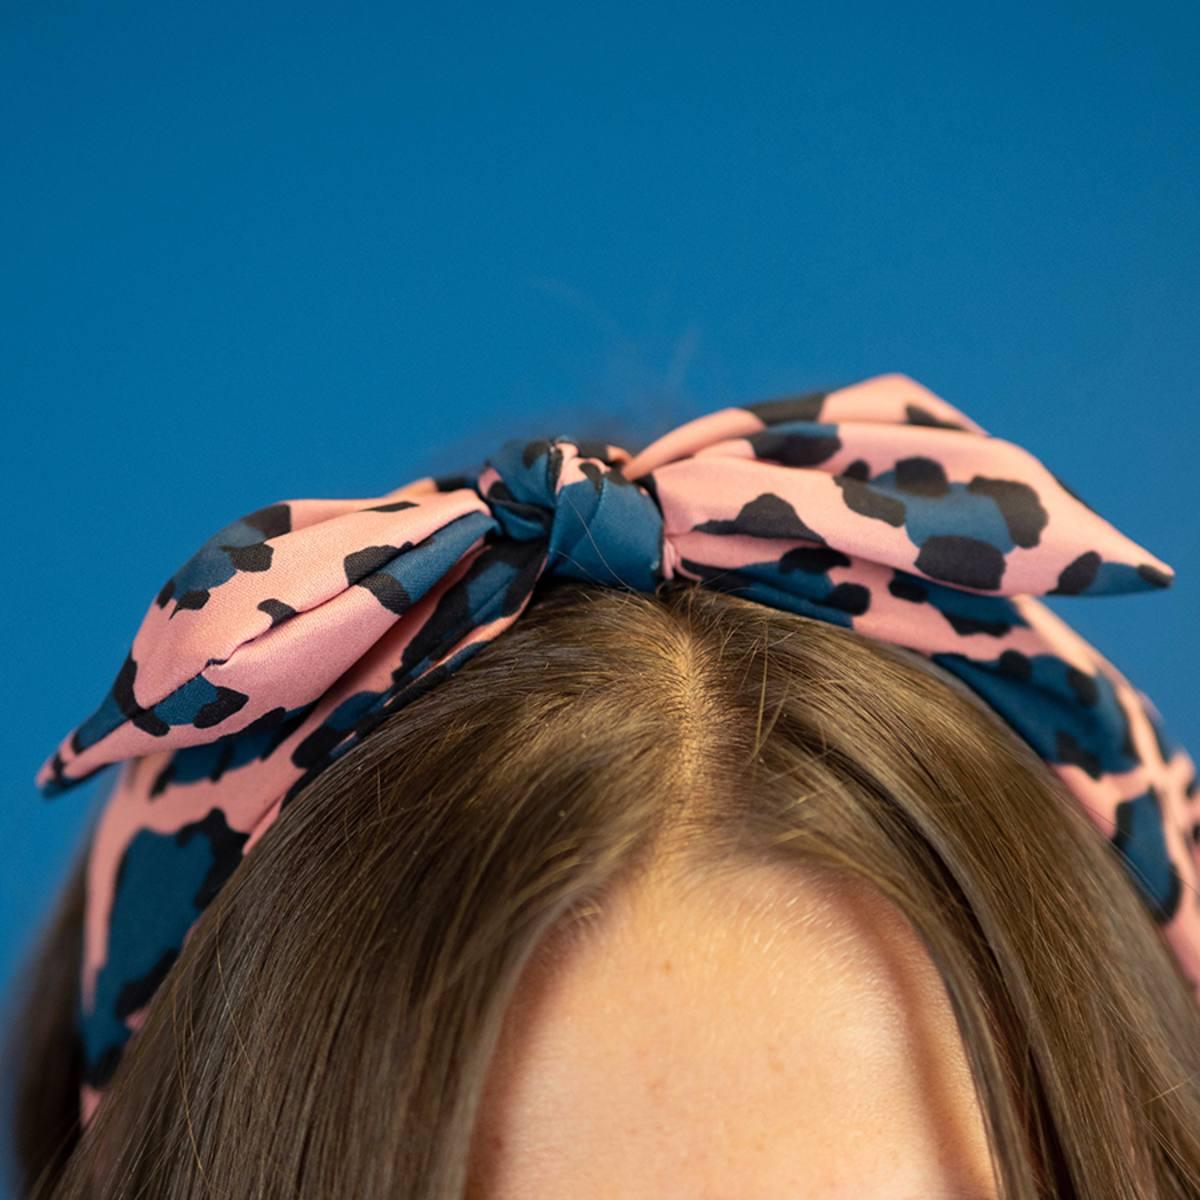 Headband in Leopard Print Pink Blue by Pom925 | Restoration Yard